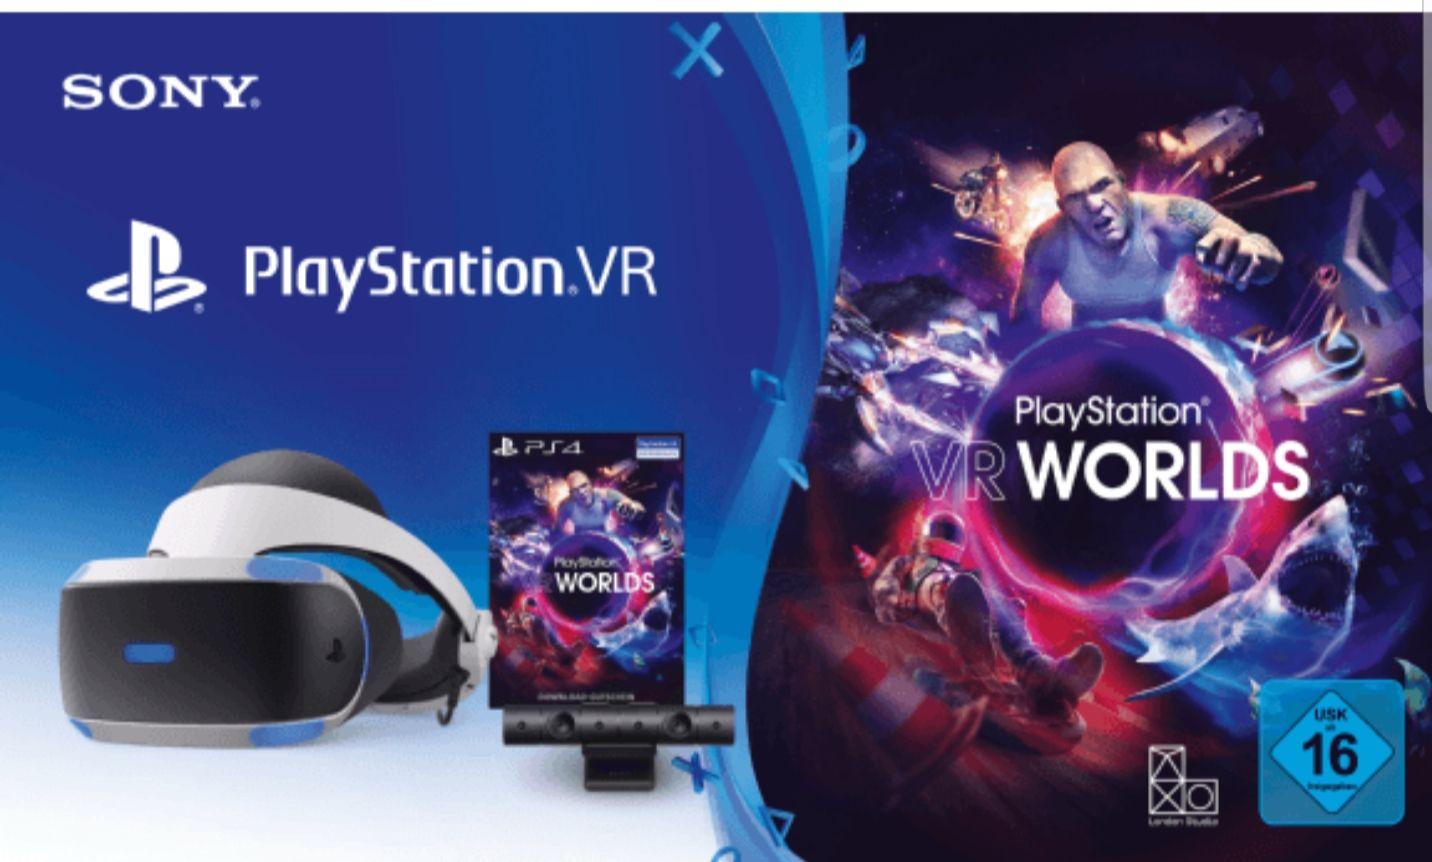 Media Markt (bis 05.01 9 Uhr) SONY PlayStation VR V2 + Camera + VR Worlds Voucher 349.99 Euro statt 399 Euro